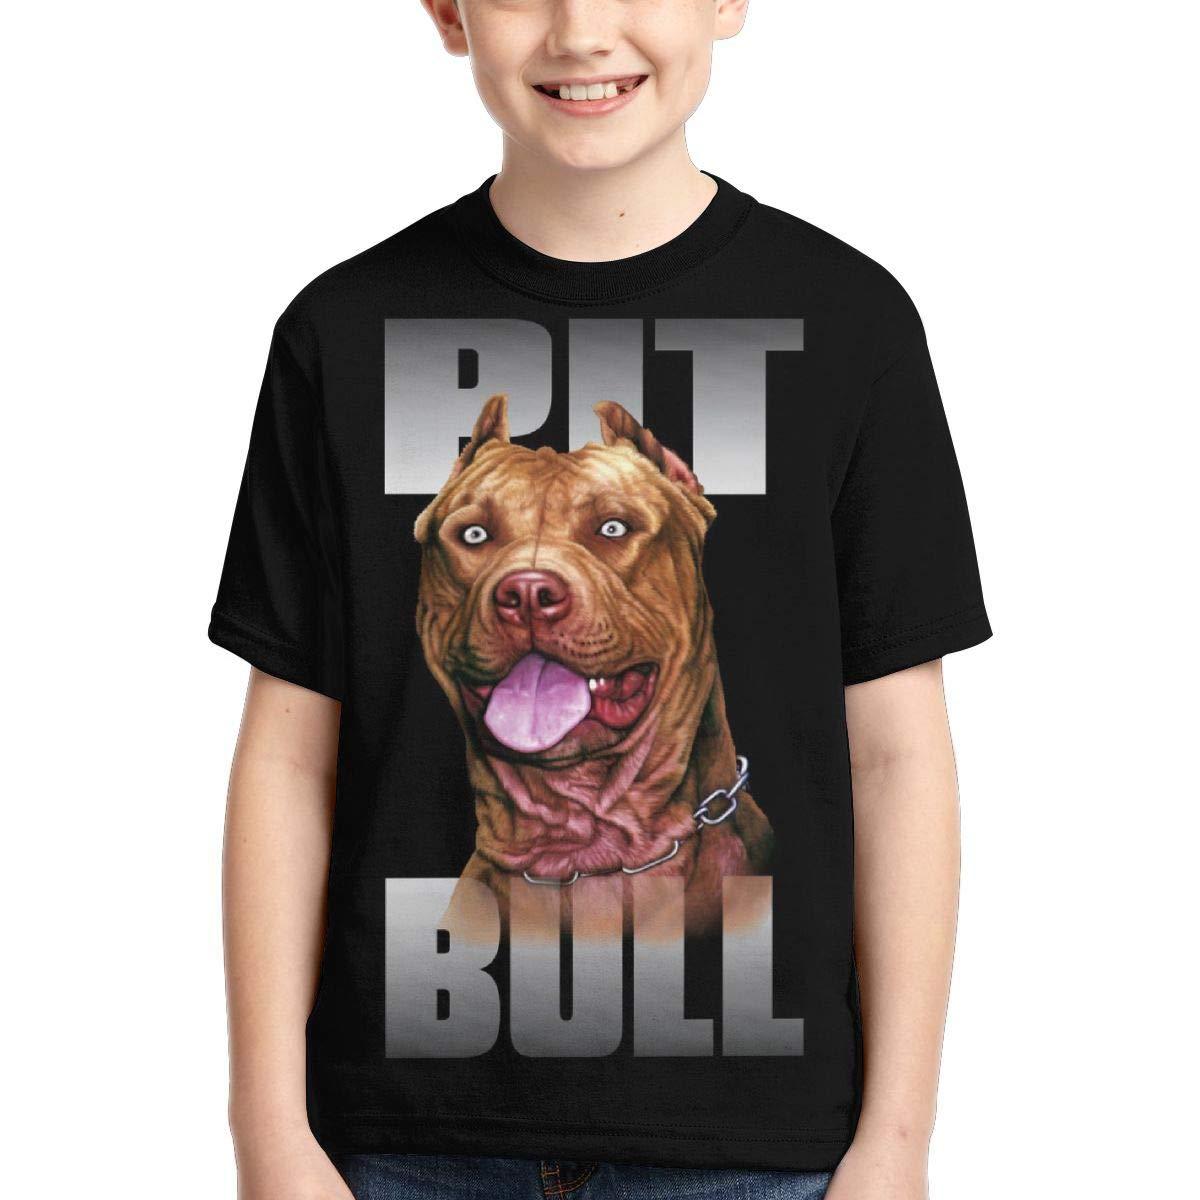 AMODECO Pitbull Dog 3D Printed Tee T-Shirt for Youth Teenager Boys Girls